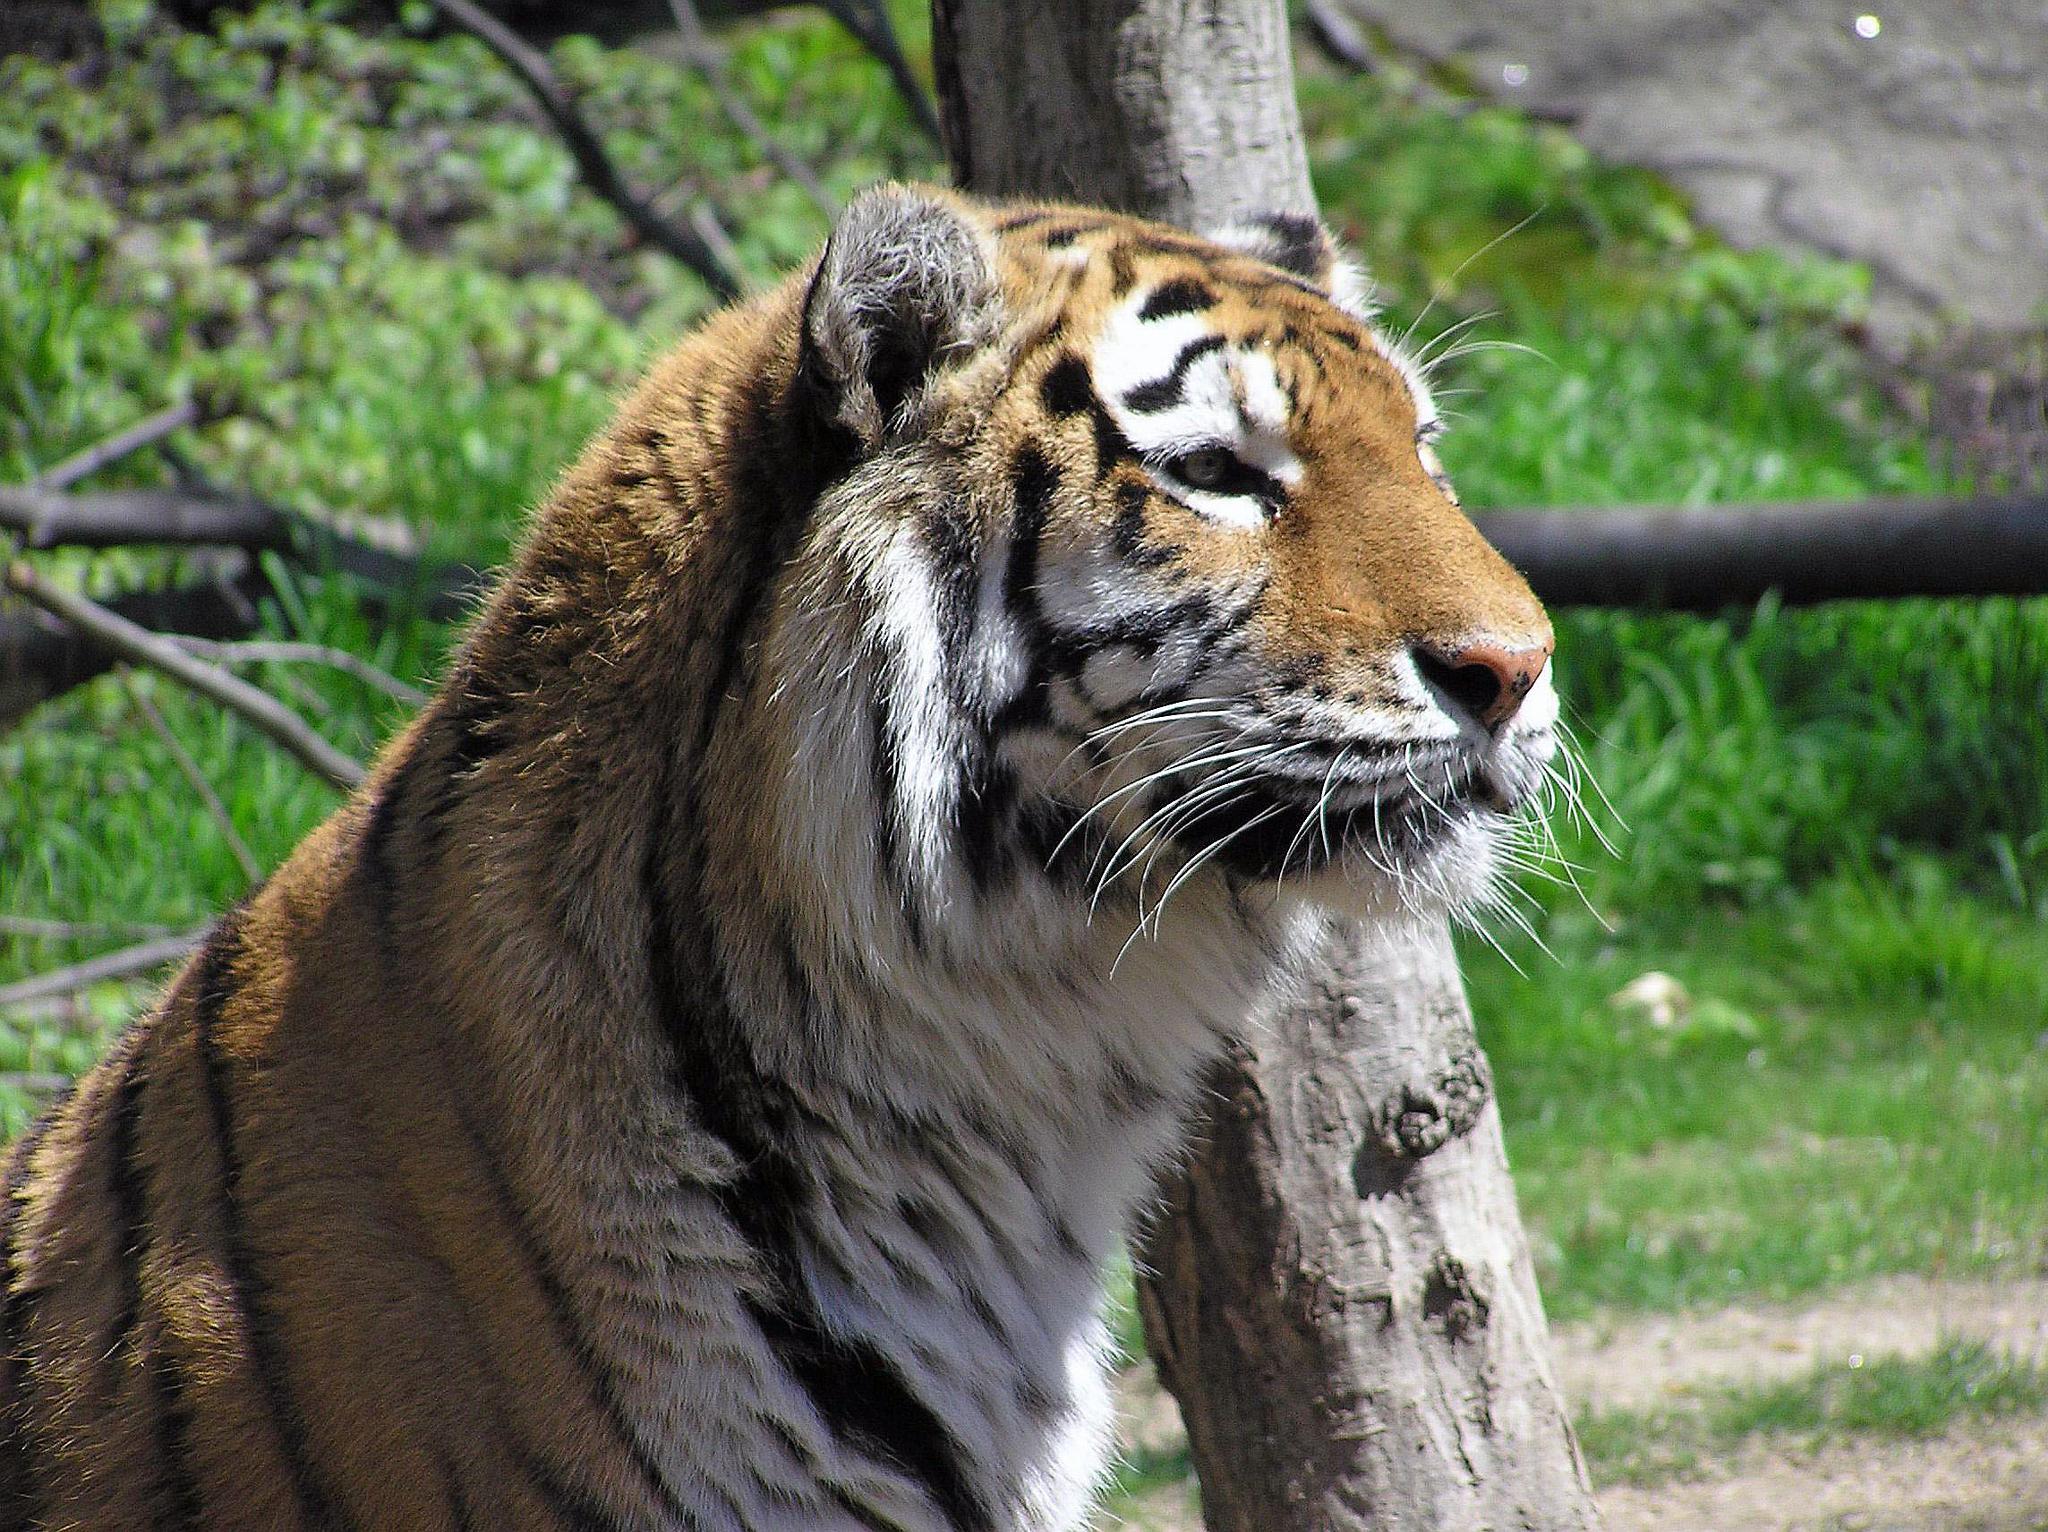 Tiger by steven.malecki.52